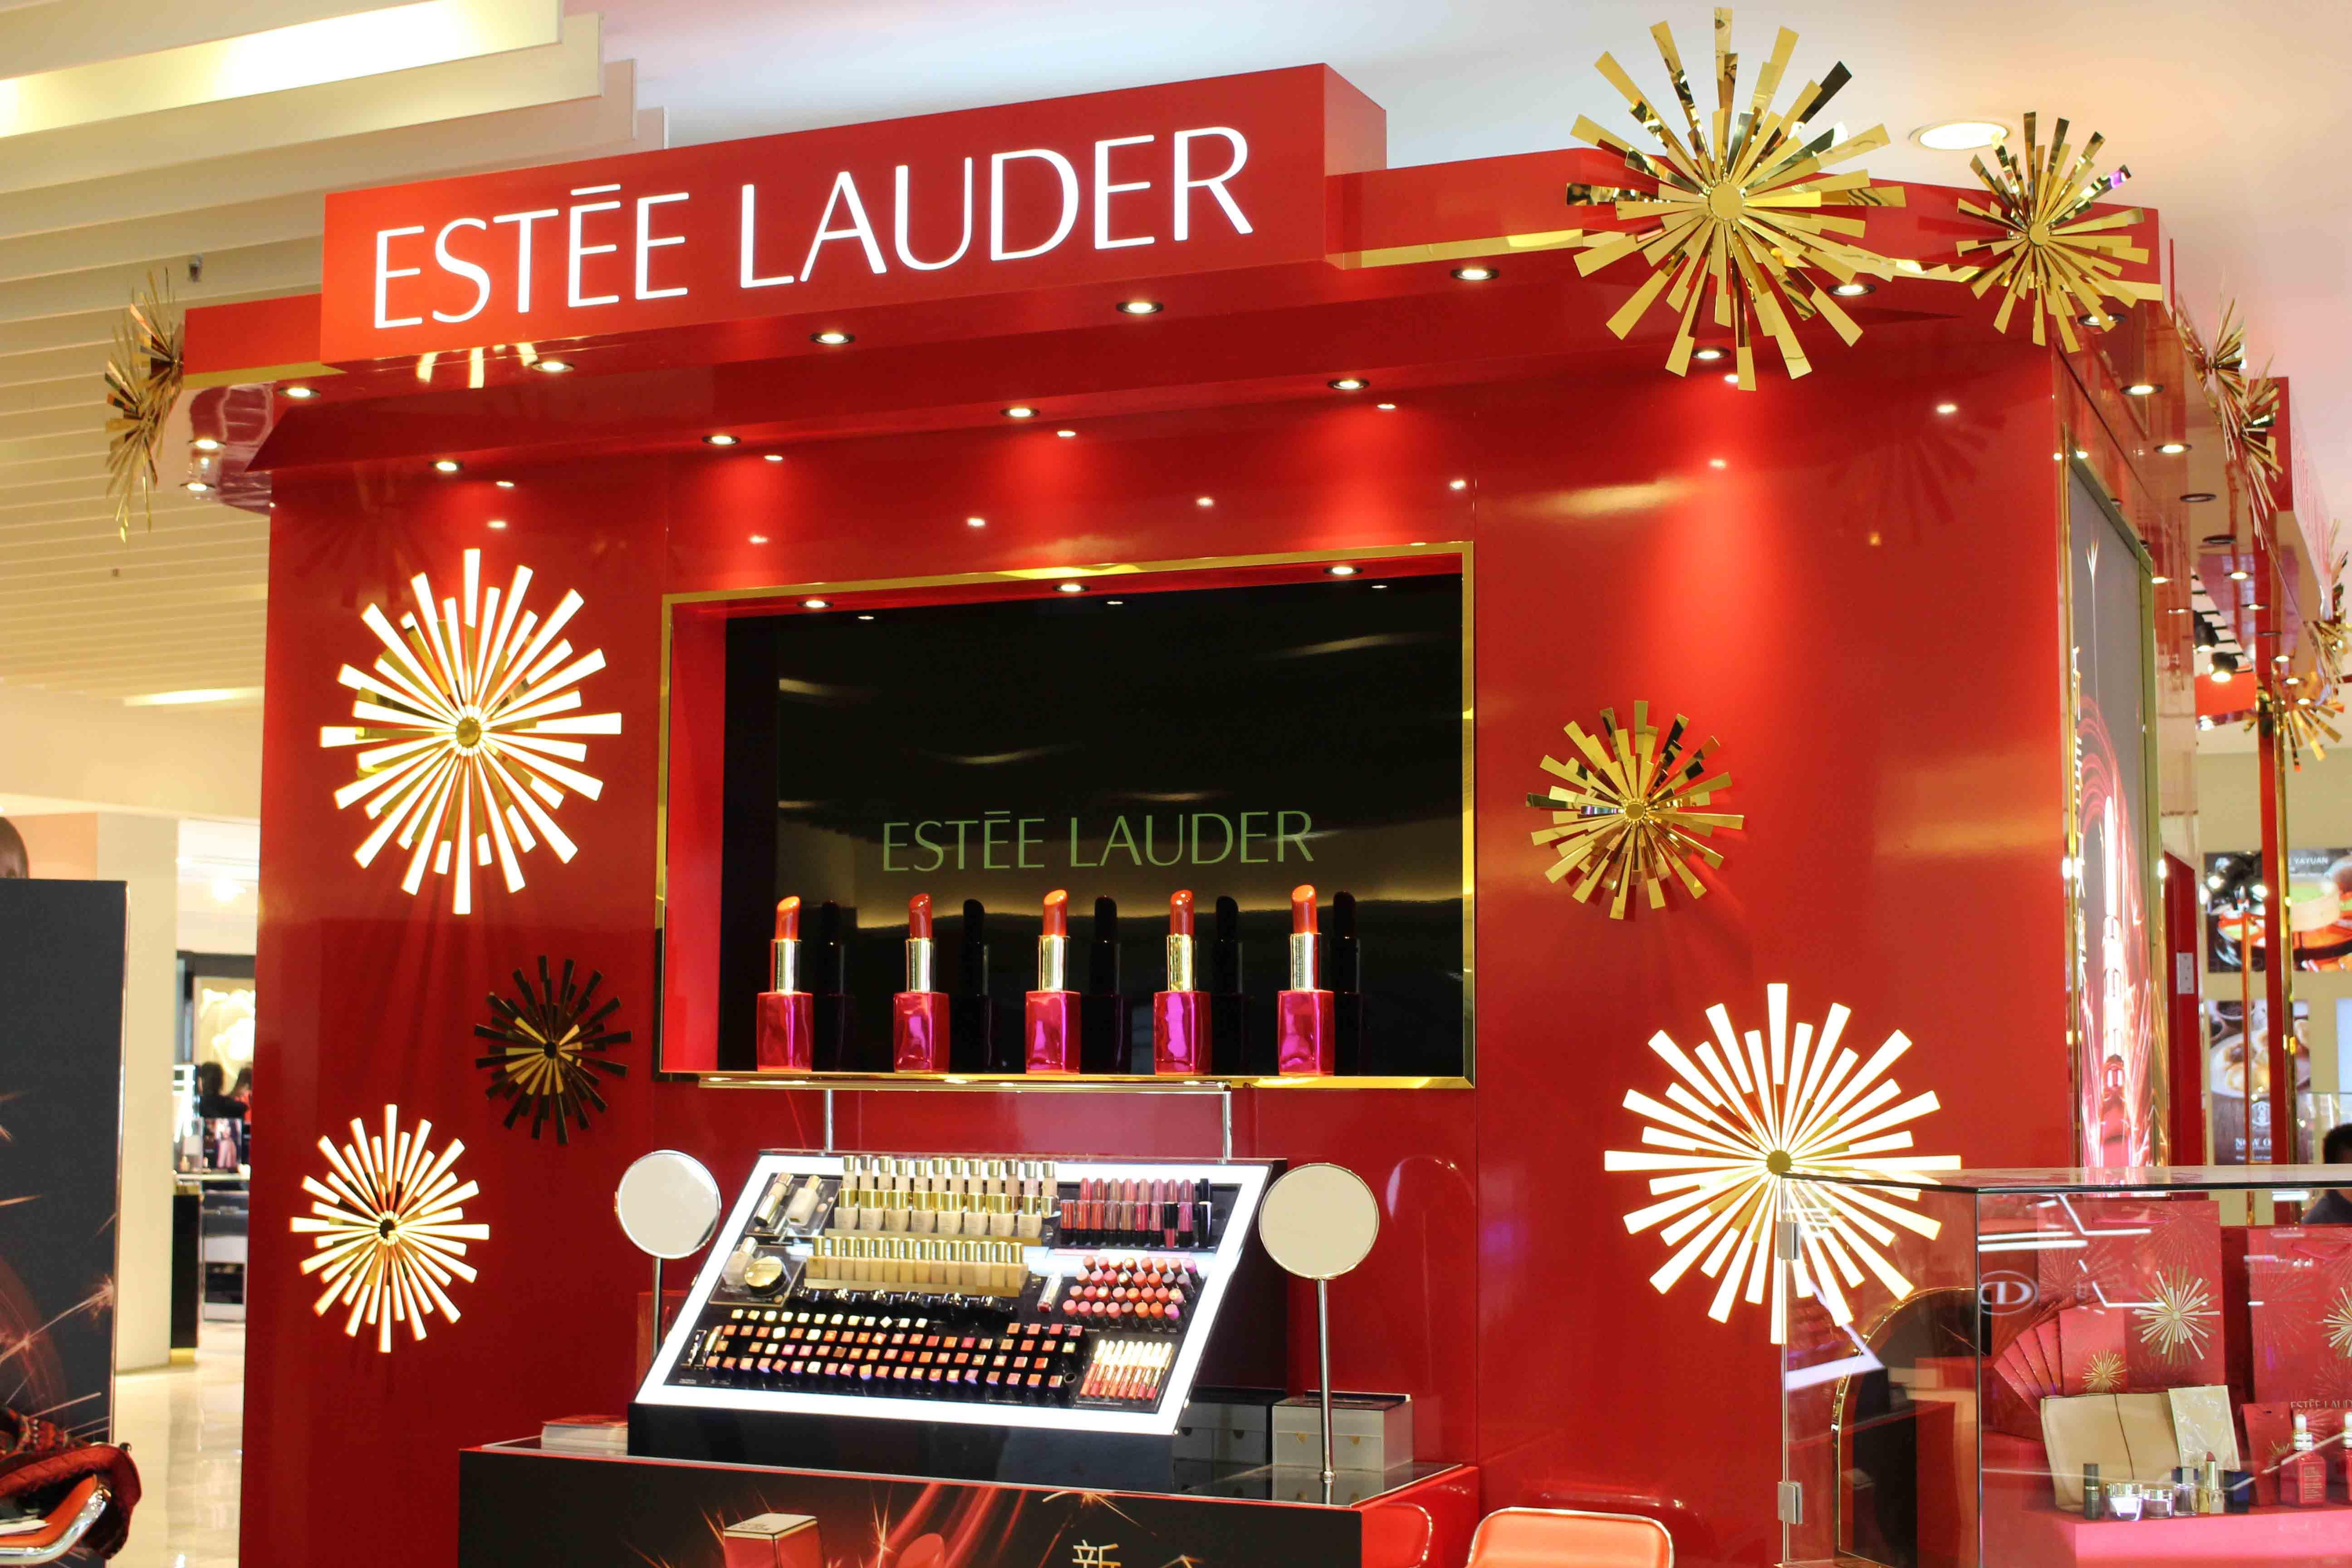 Estee Lauder Pop Up Store Pop Up Store Store Design Interior Pop Up Stores